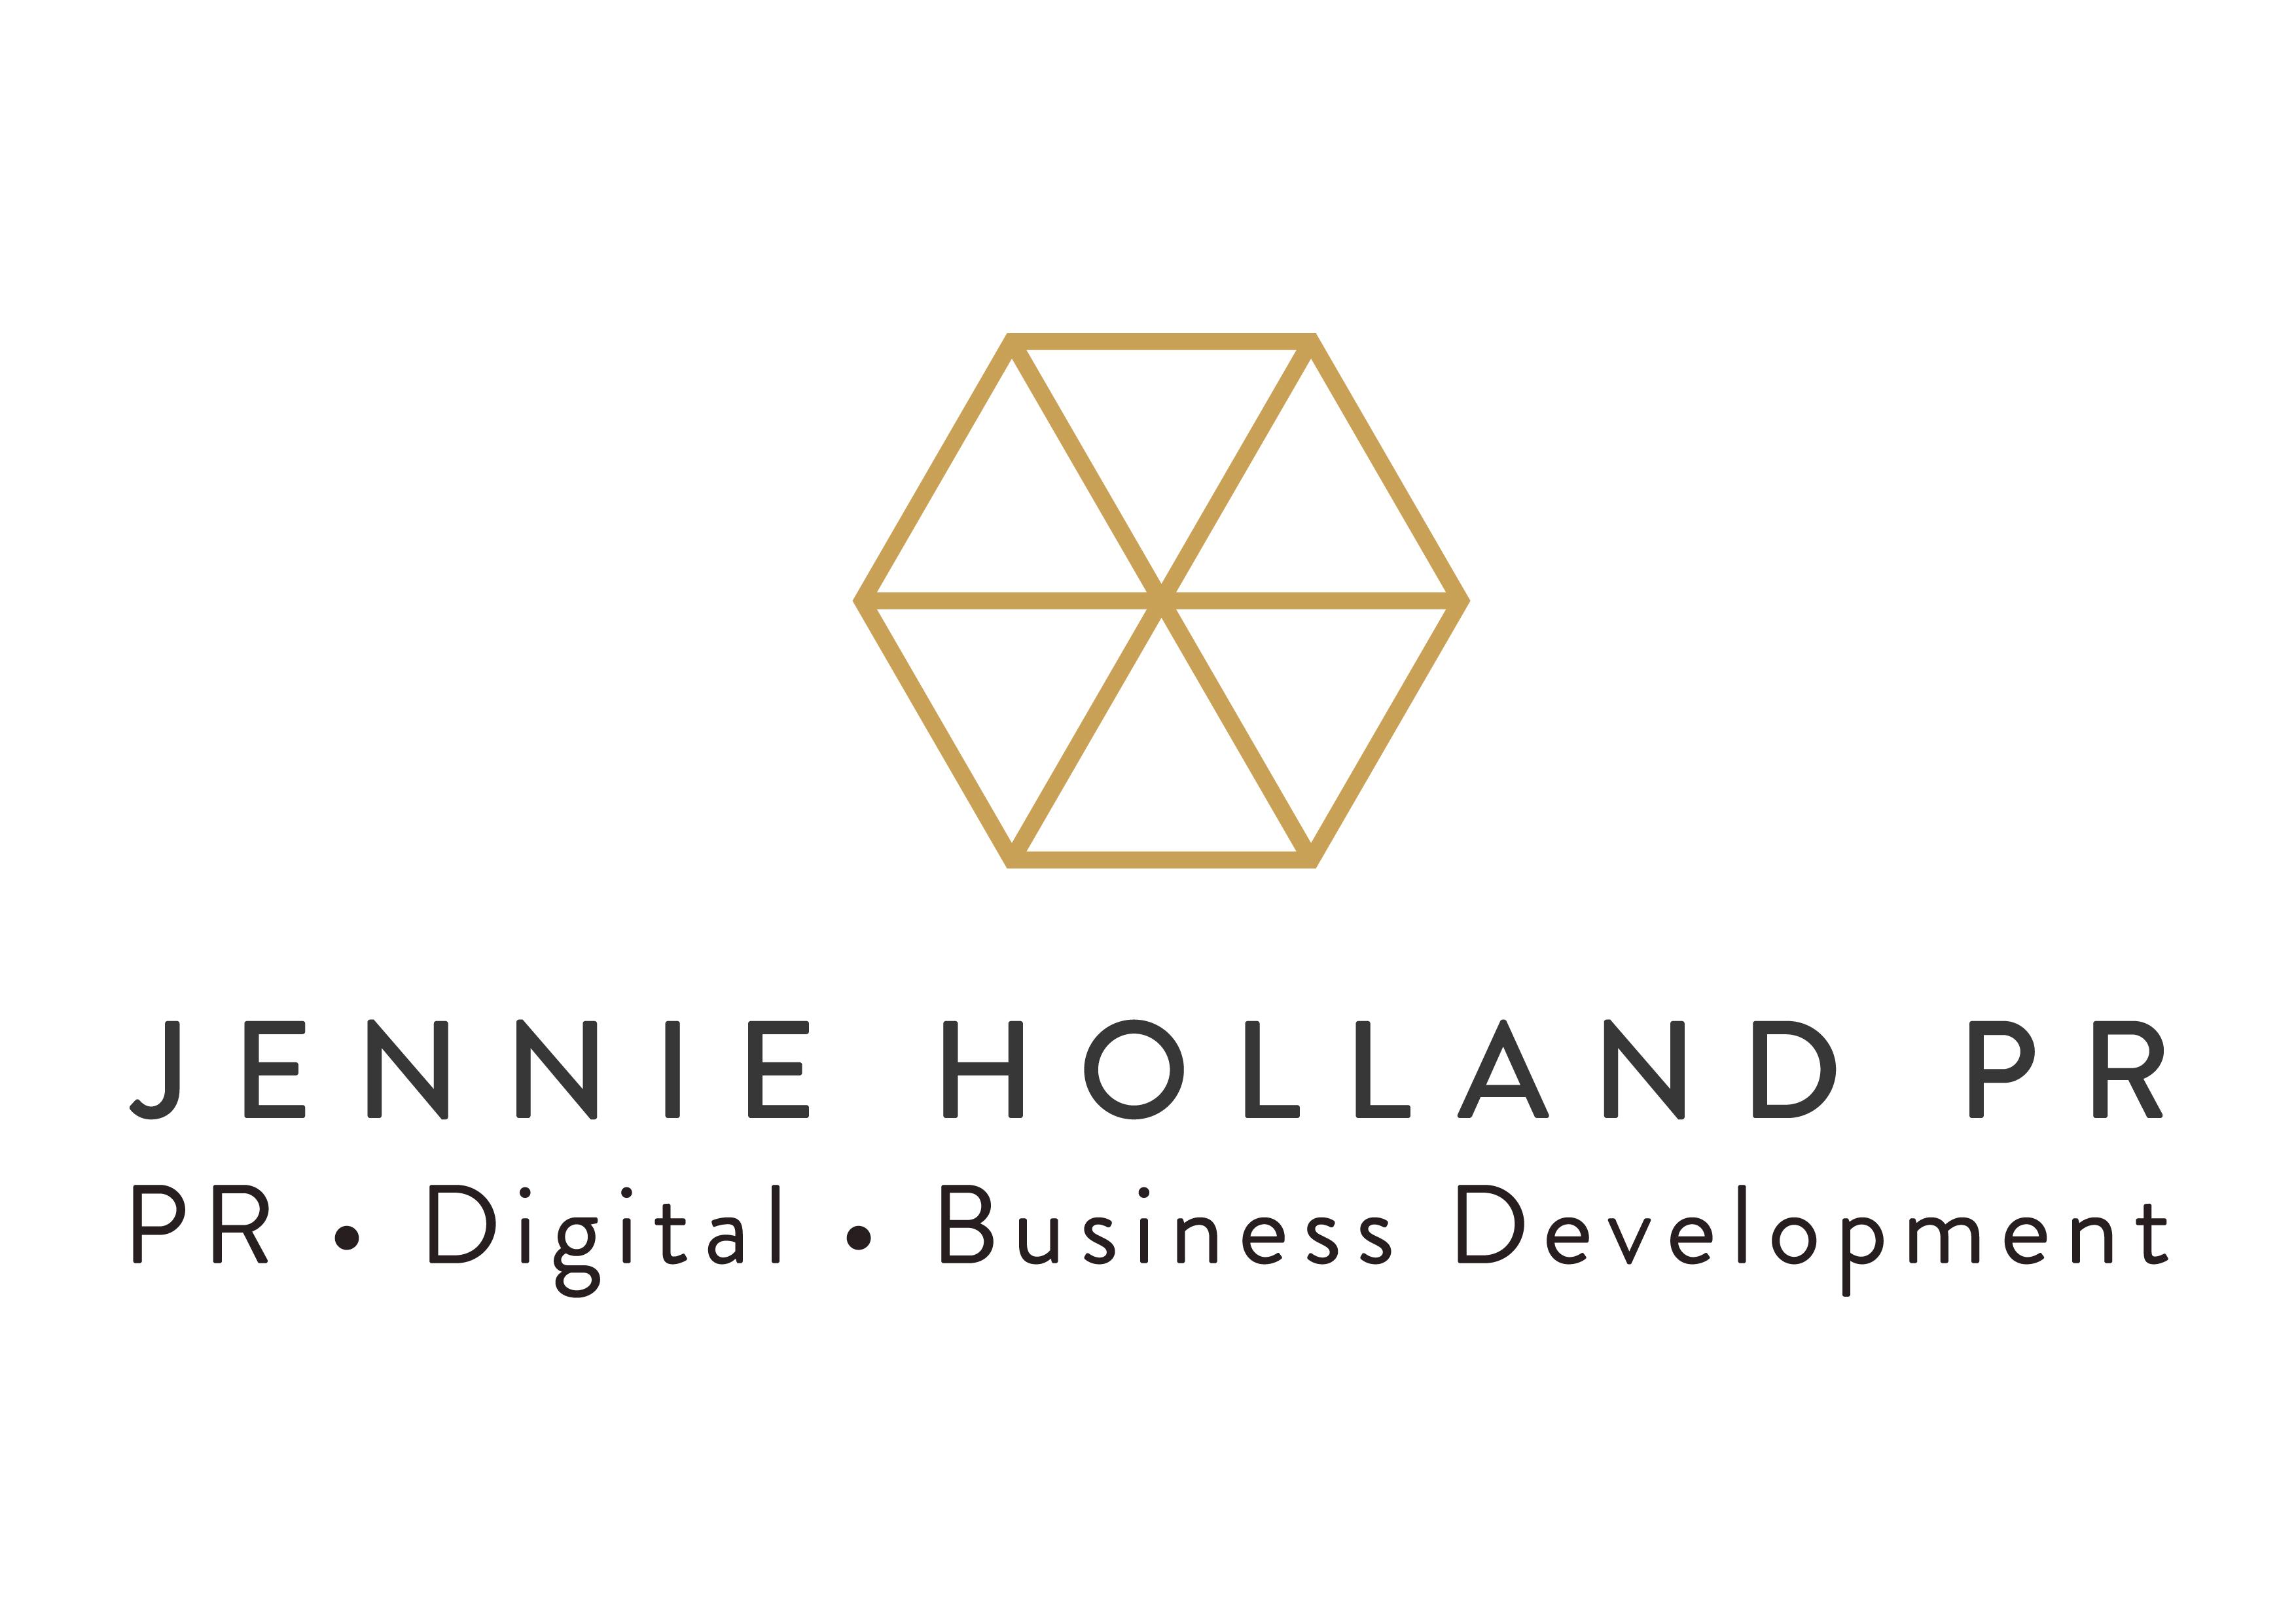 jennie-holland-pr_logo